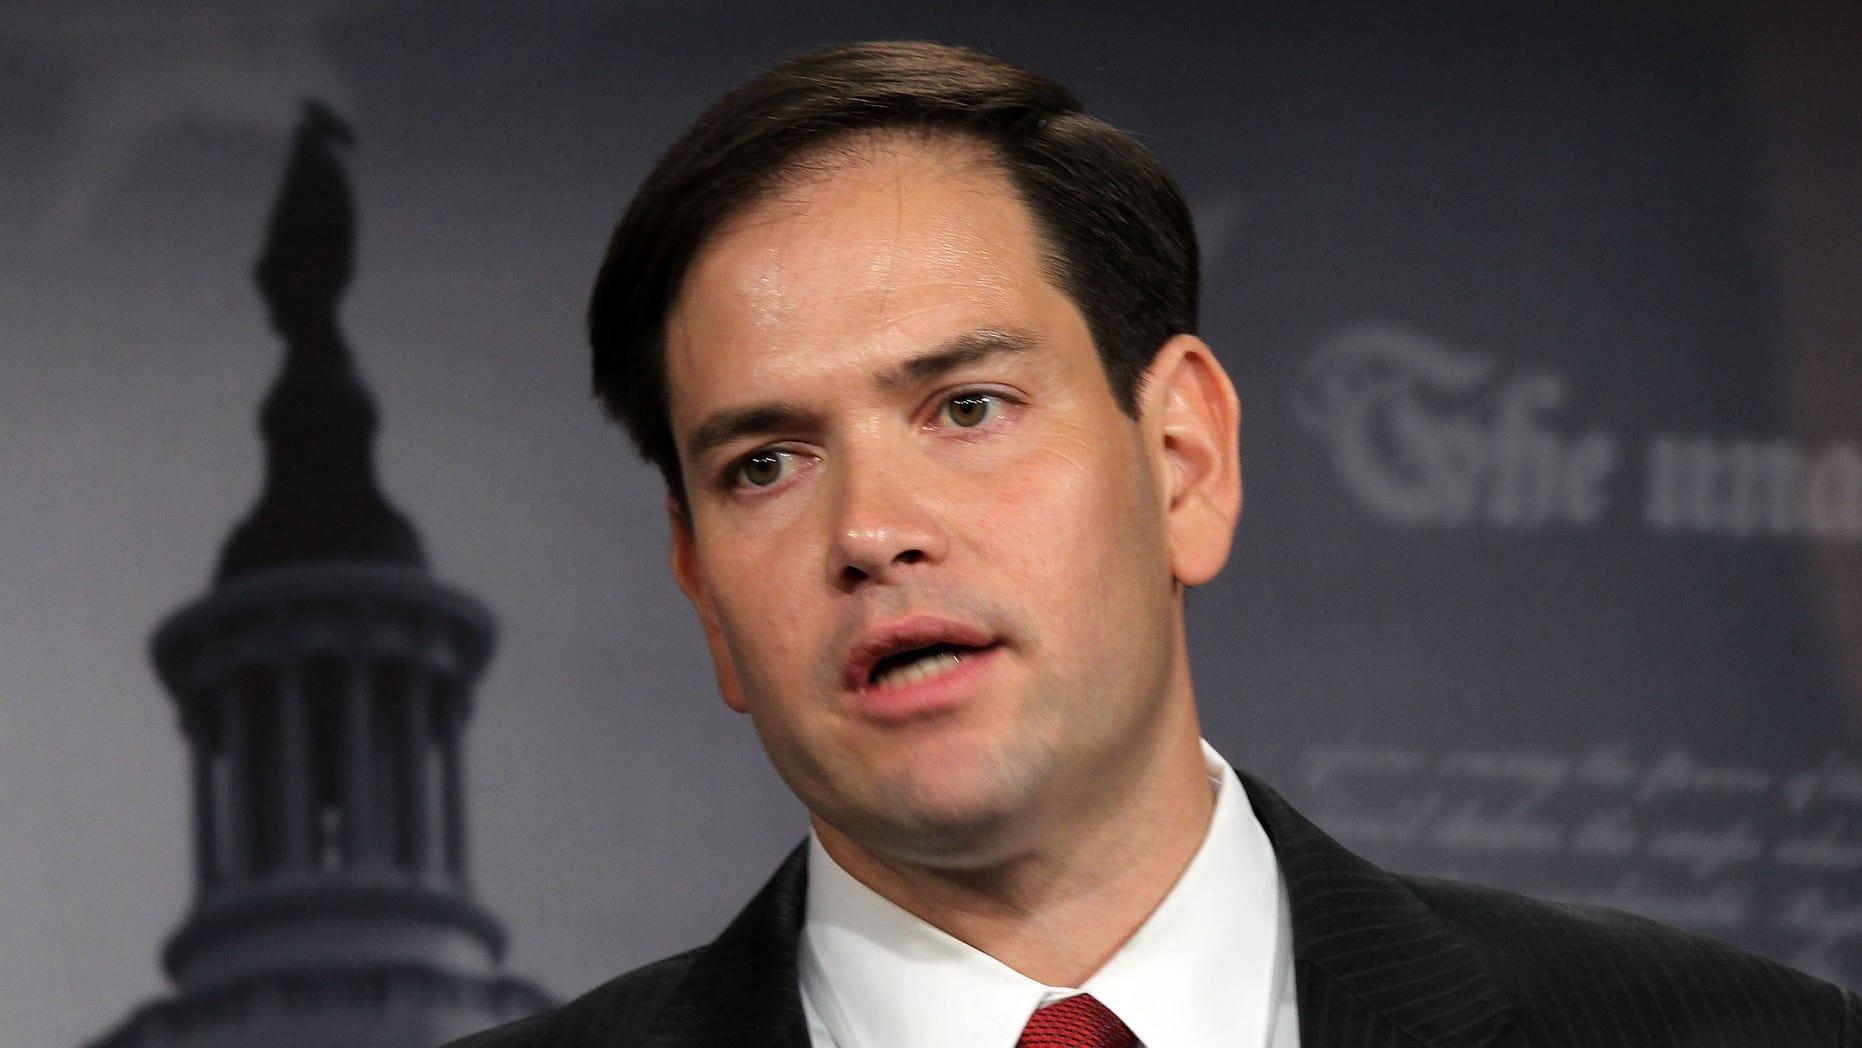 Florida Senator Marco Rubio.